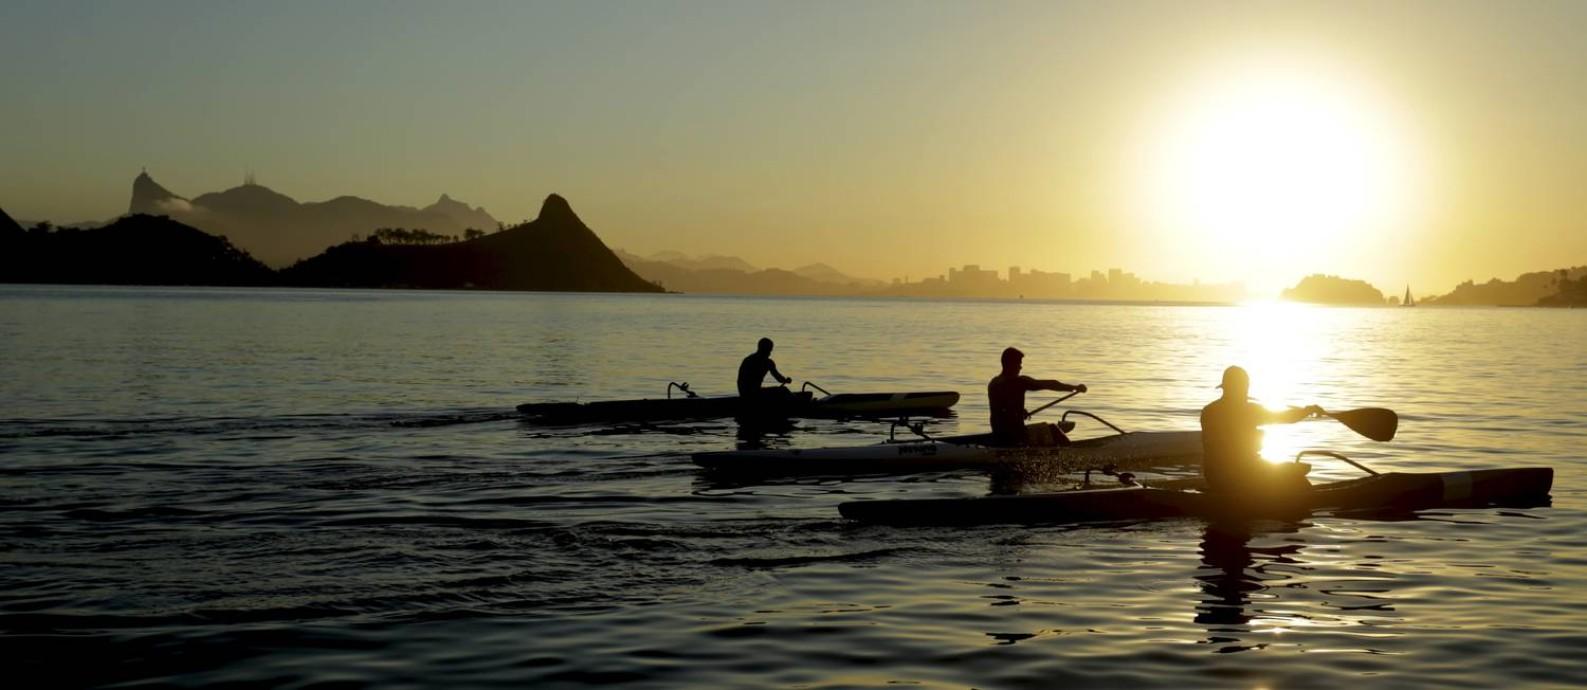 Praticantes de canoa havaiana na Praia de Charitas Foto: Marcelo Theobald / Agência O Globo